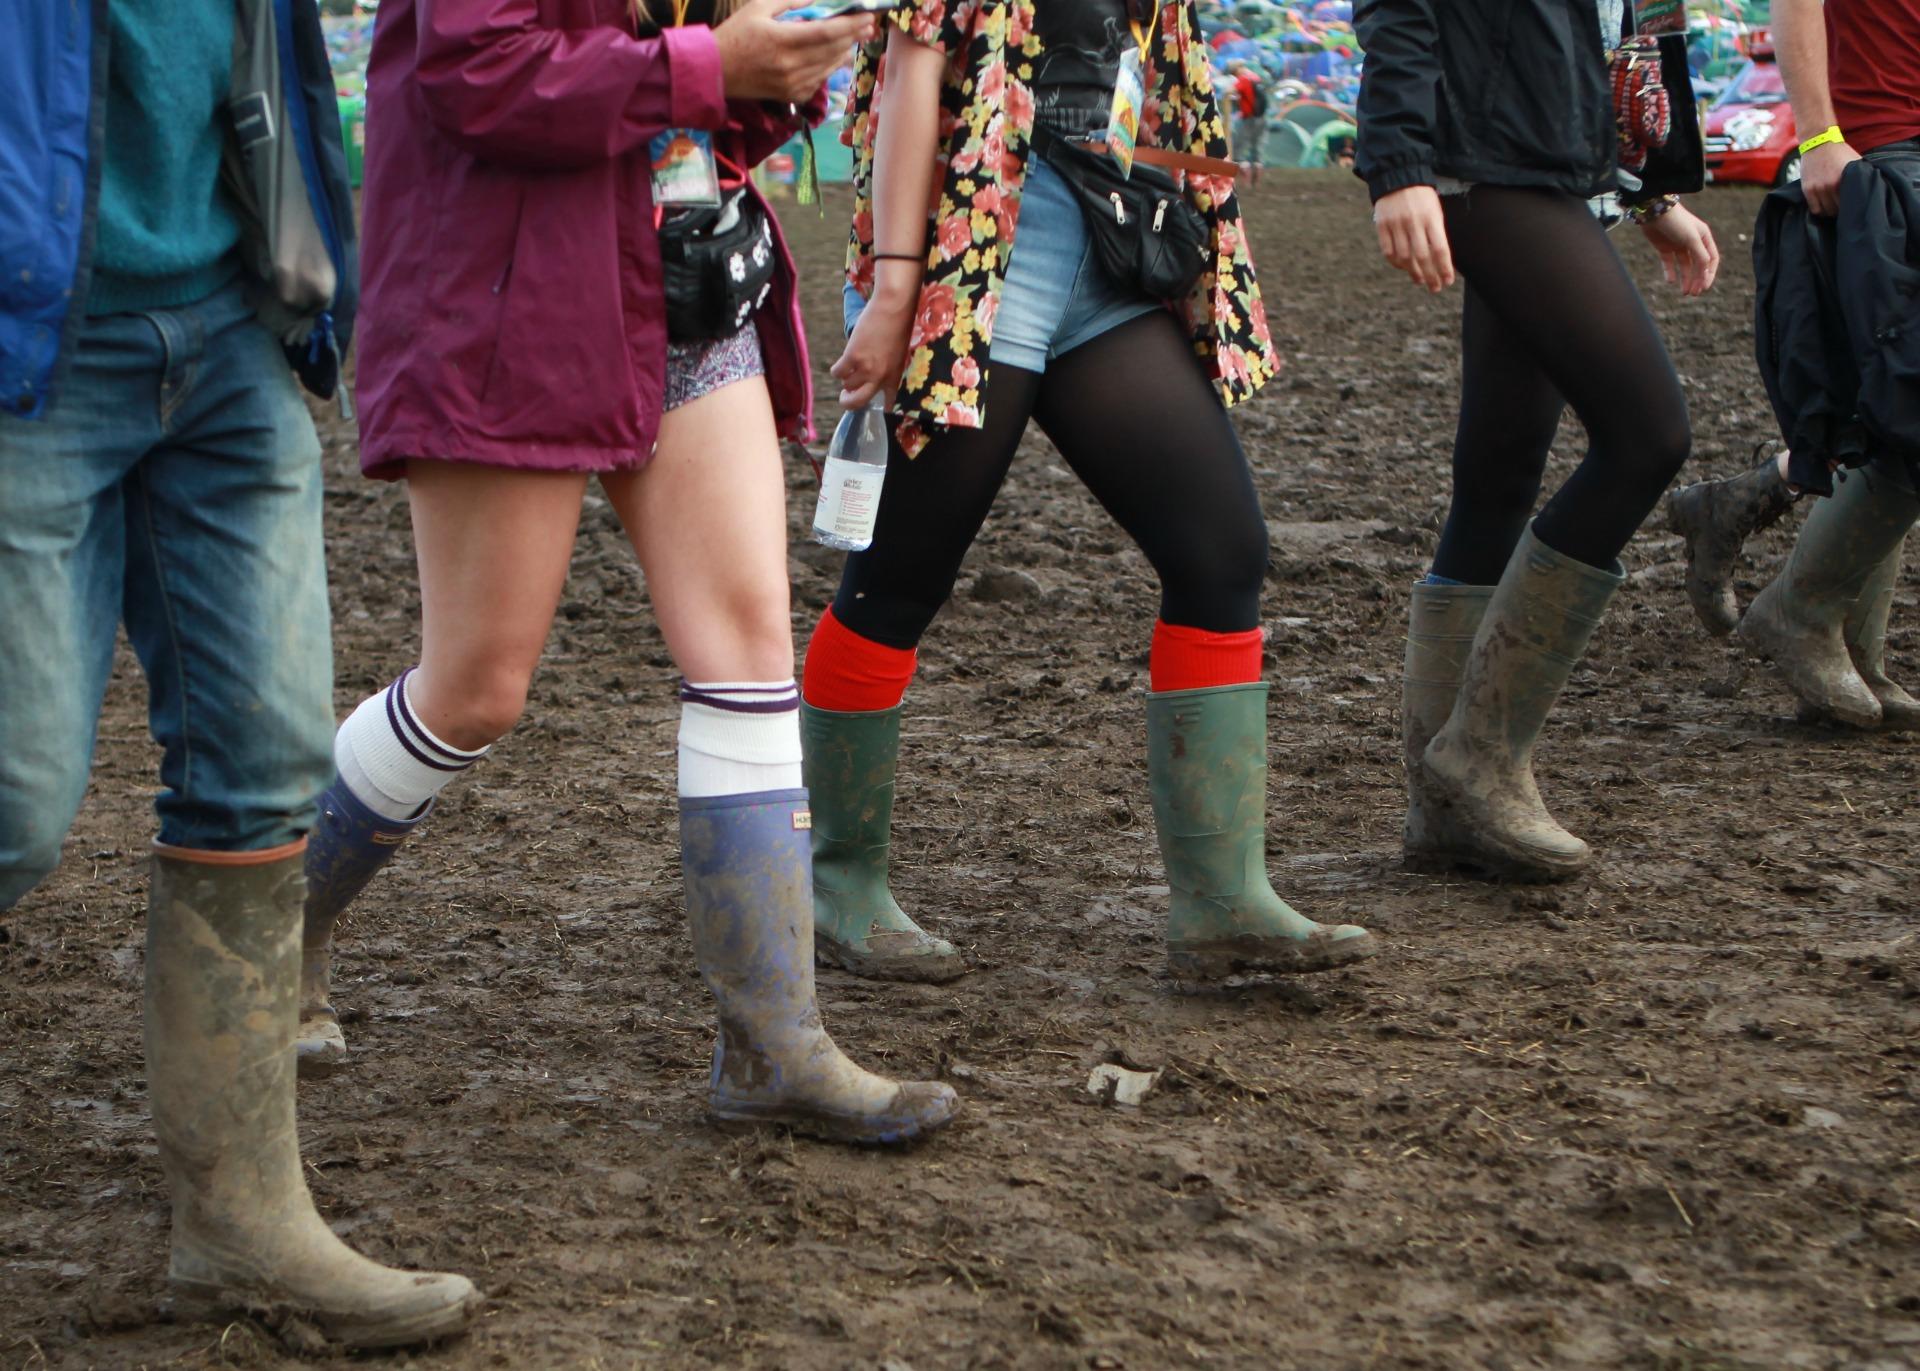 Does Glastonbury deserve its own clothing line?